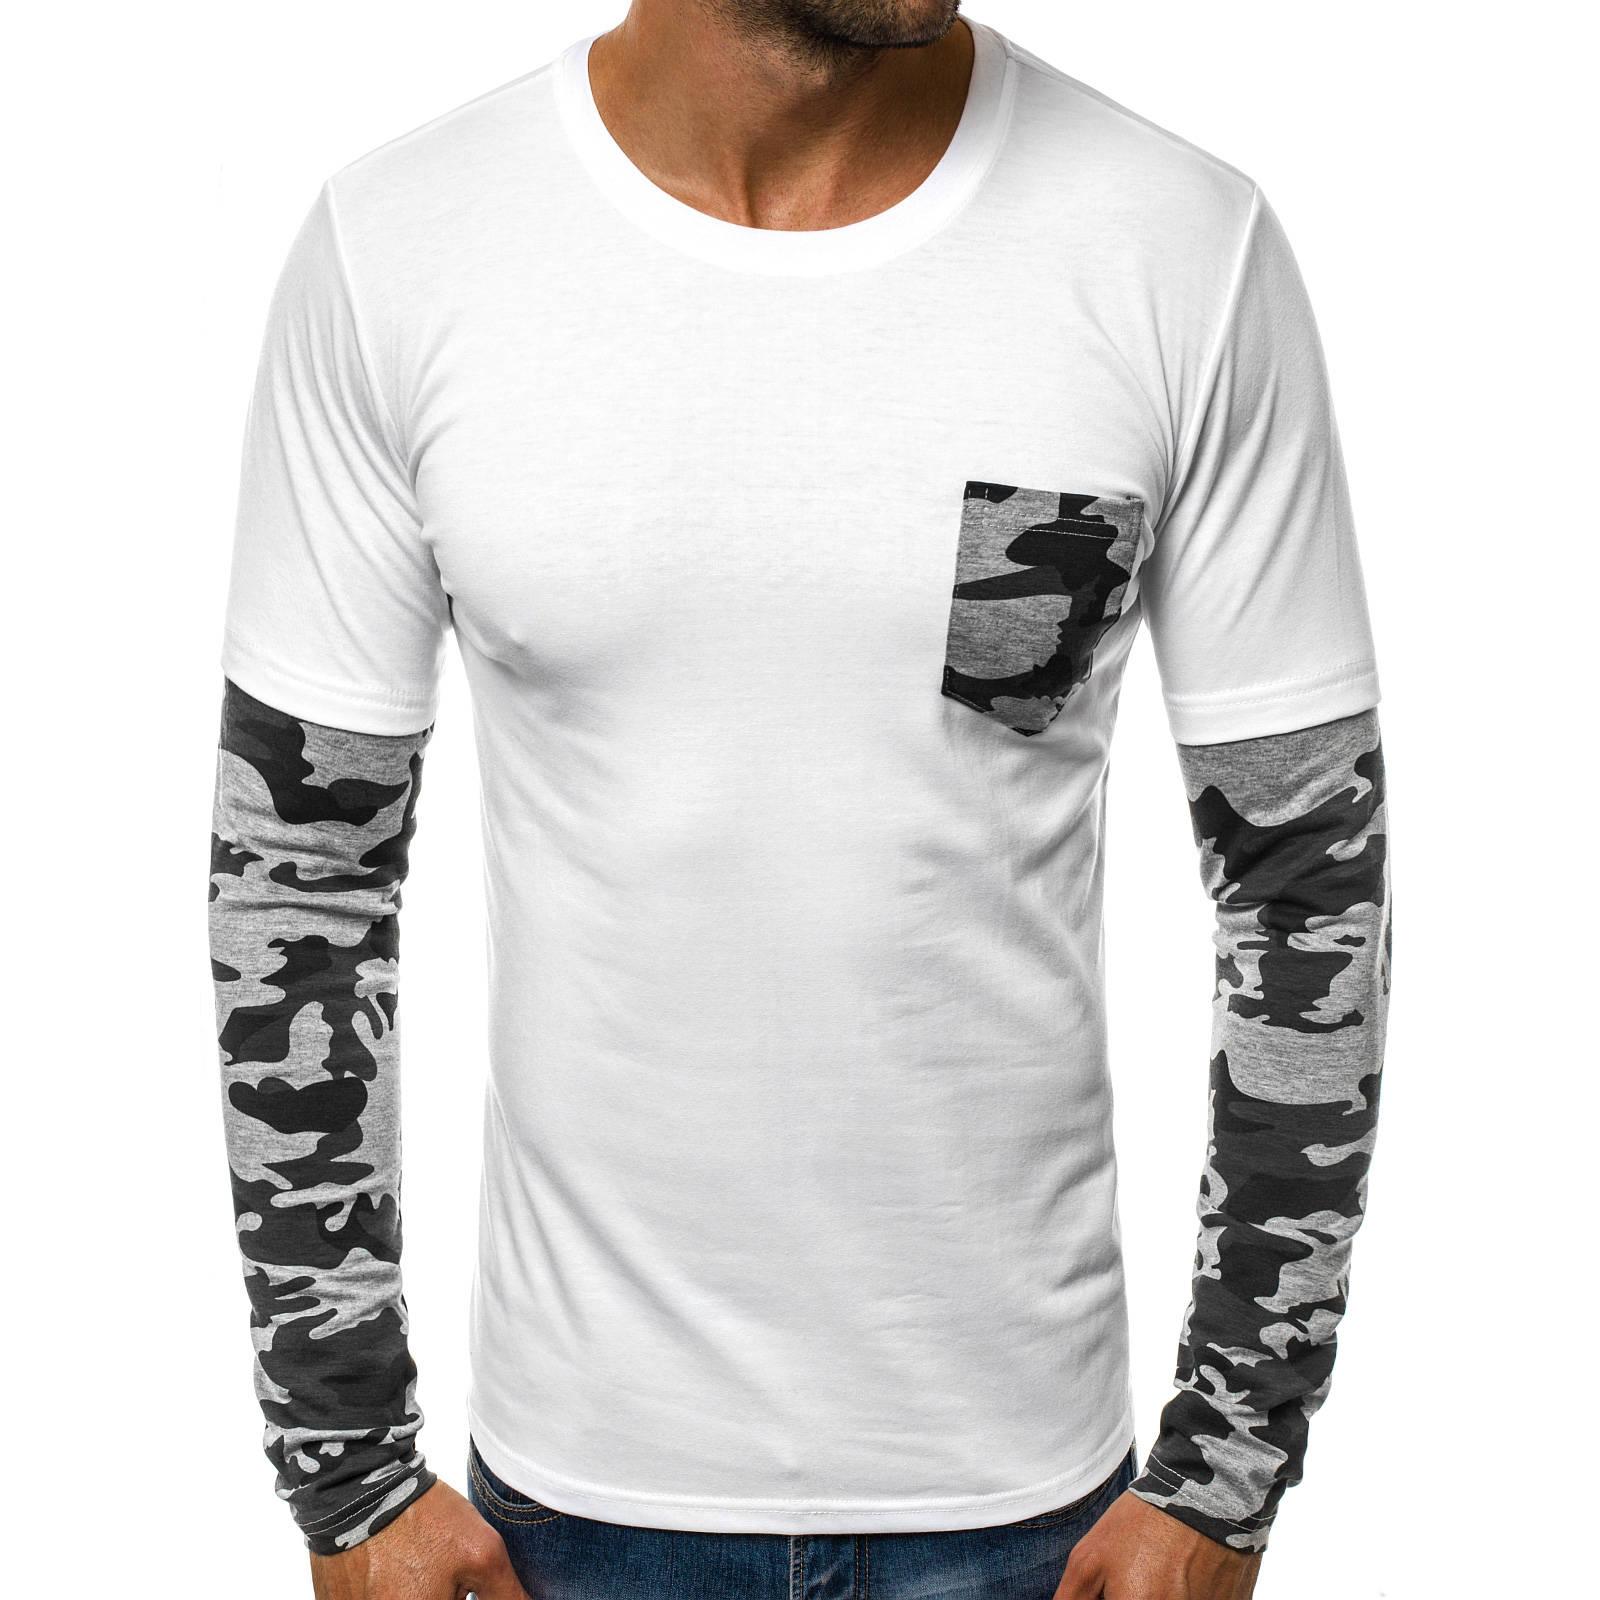 Longsleeve-Klassiker-Langarm-Shirt-Sweatshirt-Herren-OZONEE-J-STYLE-2088-MIX